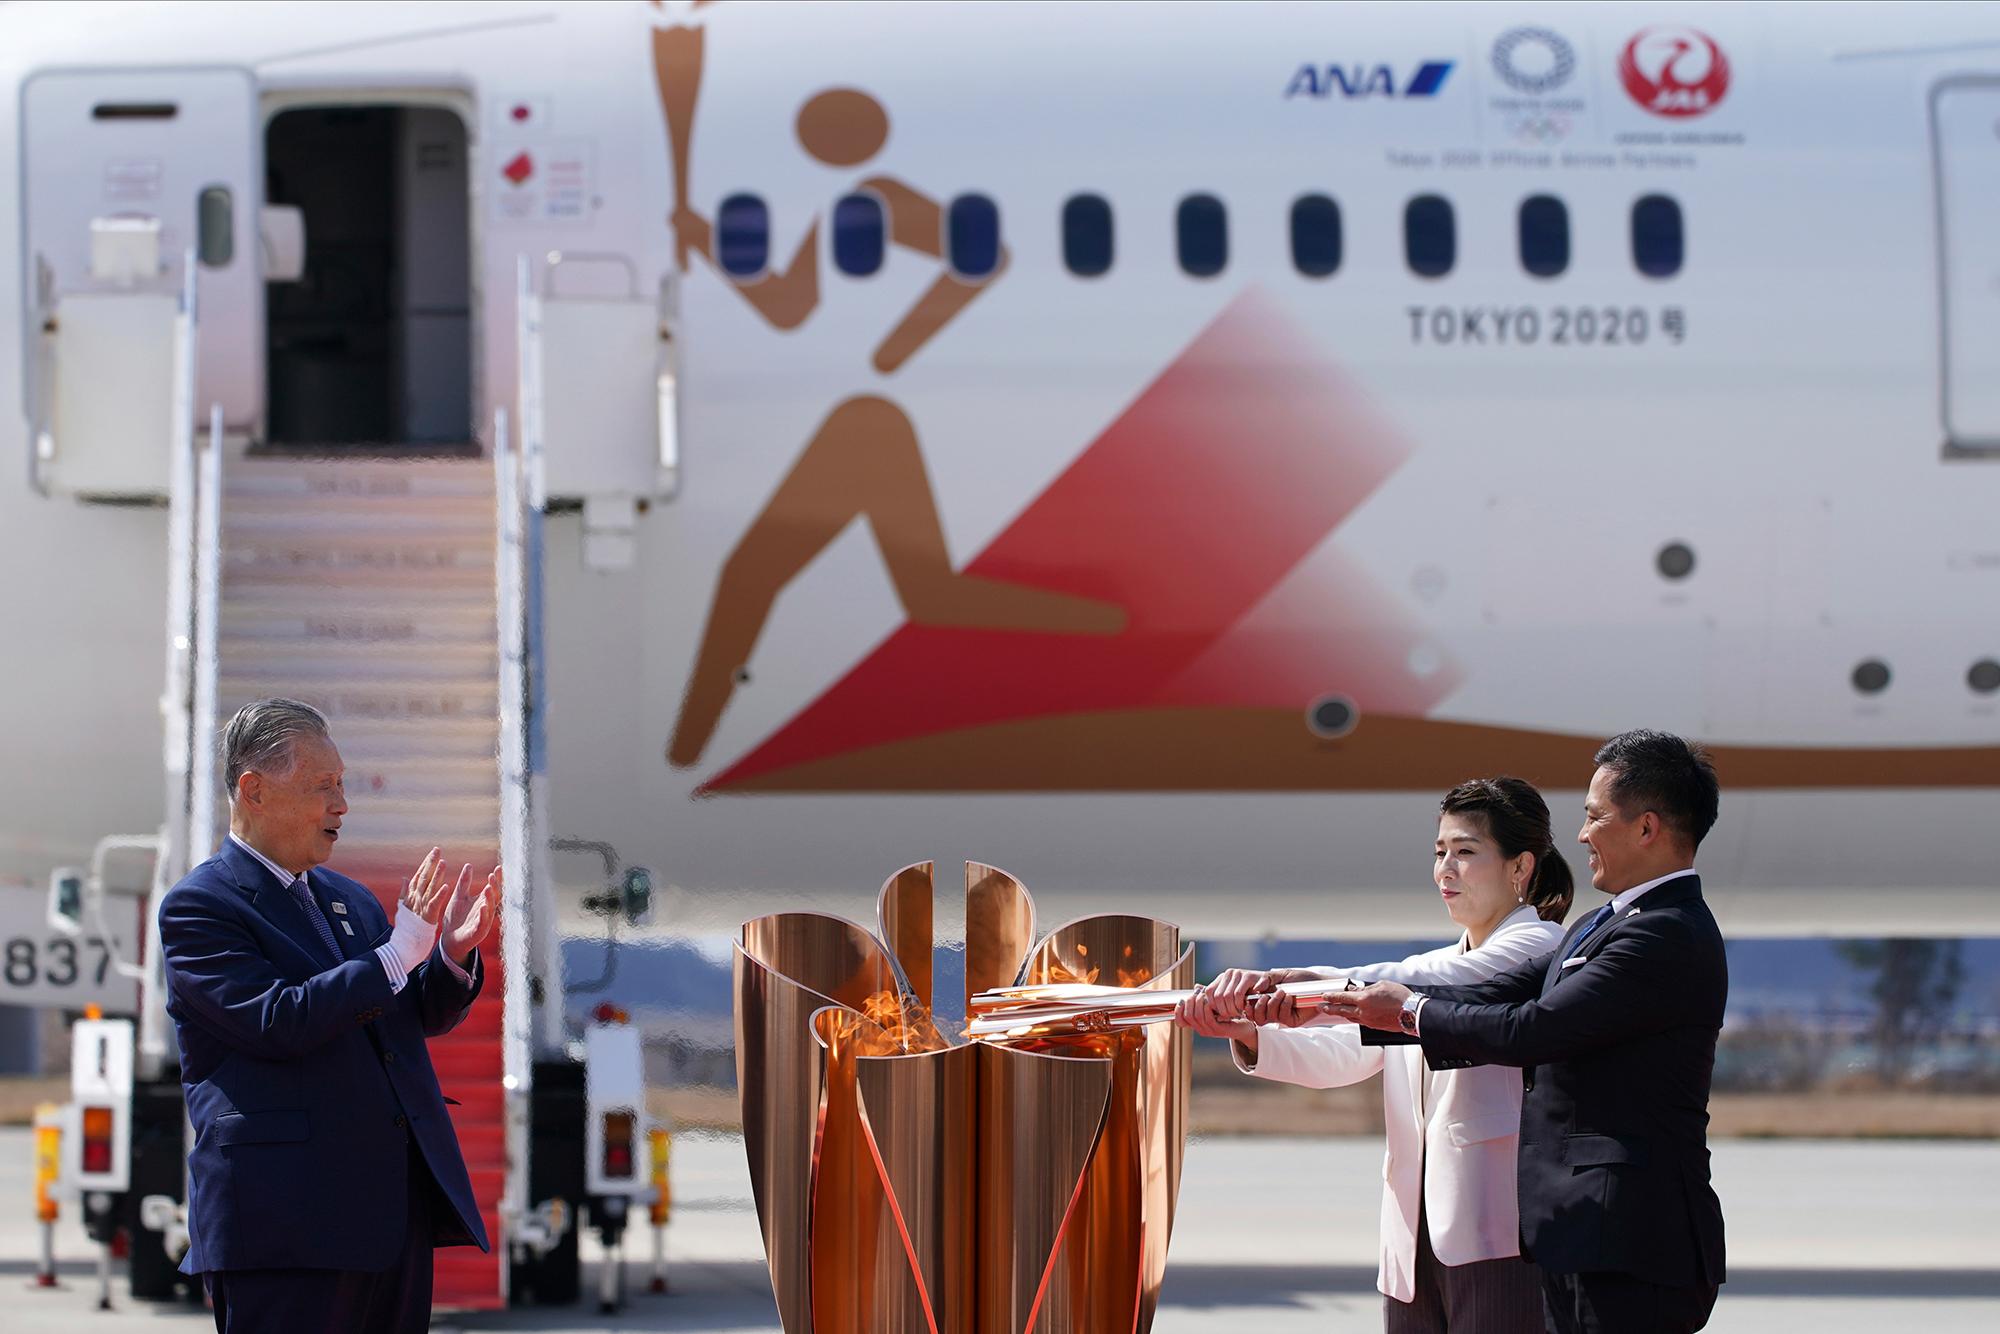 Three-time Olympic gold medalists Tadahiro Nomura, right, and Saori Yoshida light the torch as Tokyo 2020 Olympics chief Yoshiro Mori, far left, watches at the Japan Air Self-Defense Force's Matsushima Base in Higashimatsushima, Japan, on Friday, March 20.